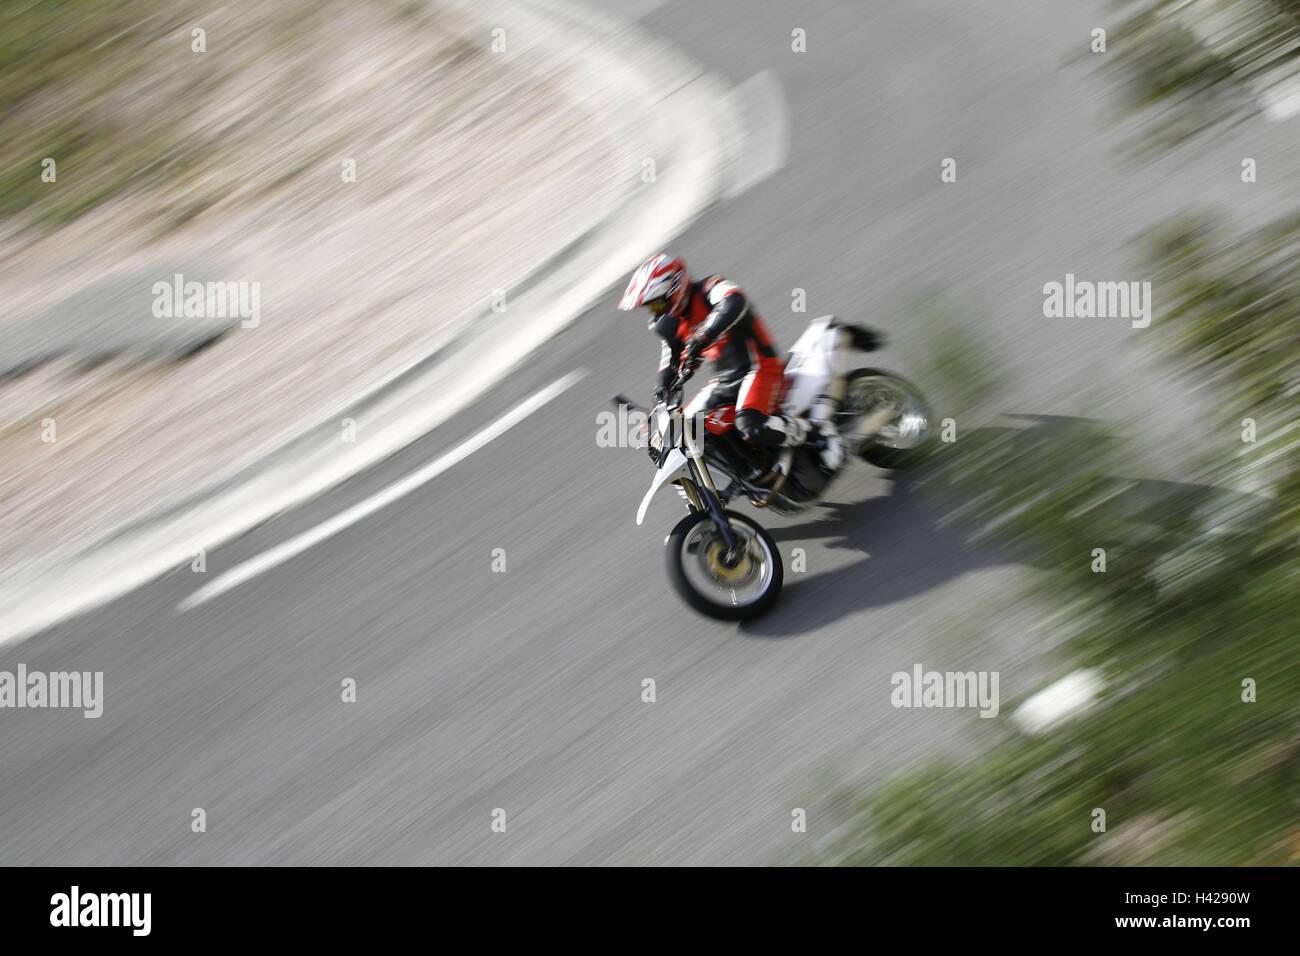 Motorcycle, single cylinder engine fun bikes, Husqvarna - Stock Image